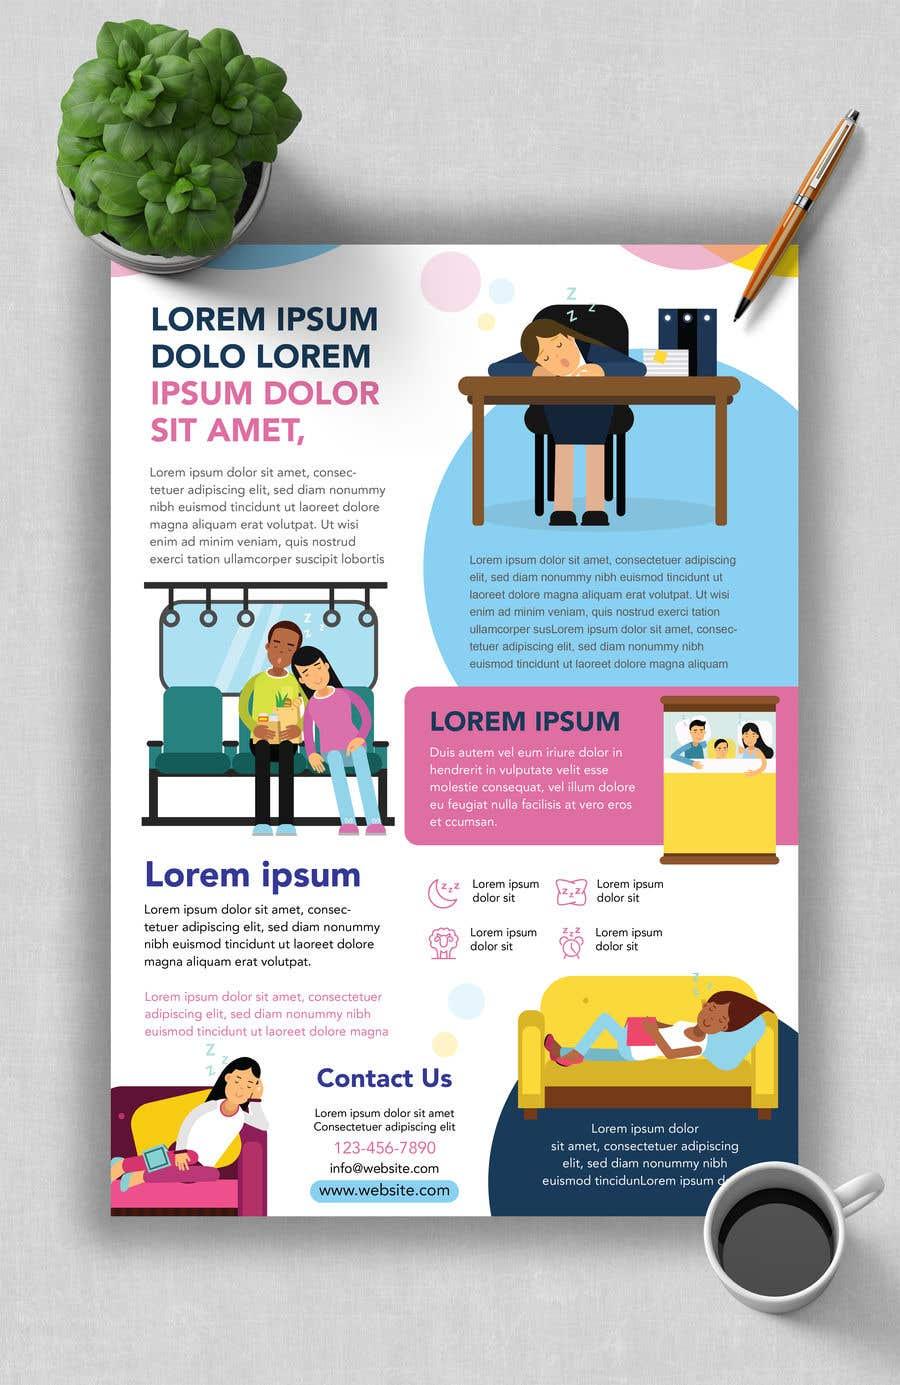 Penyertaan Peraduan #                                        74                                      untuk                                         Design a Portrait style Poster/flyer.